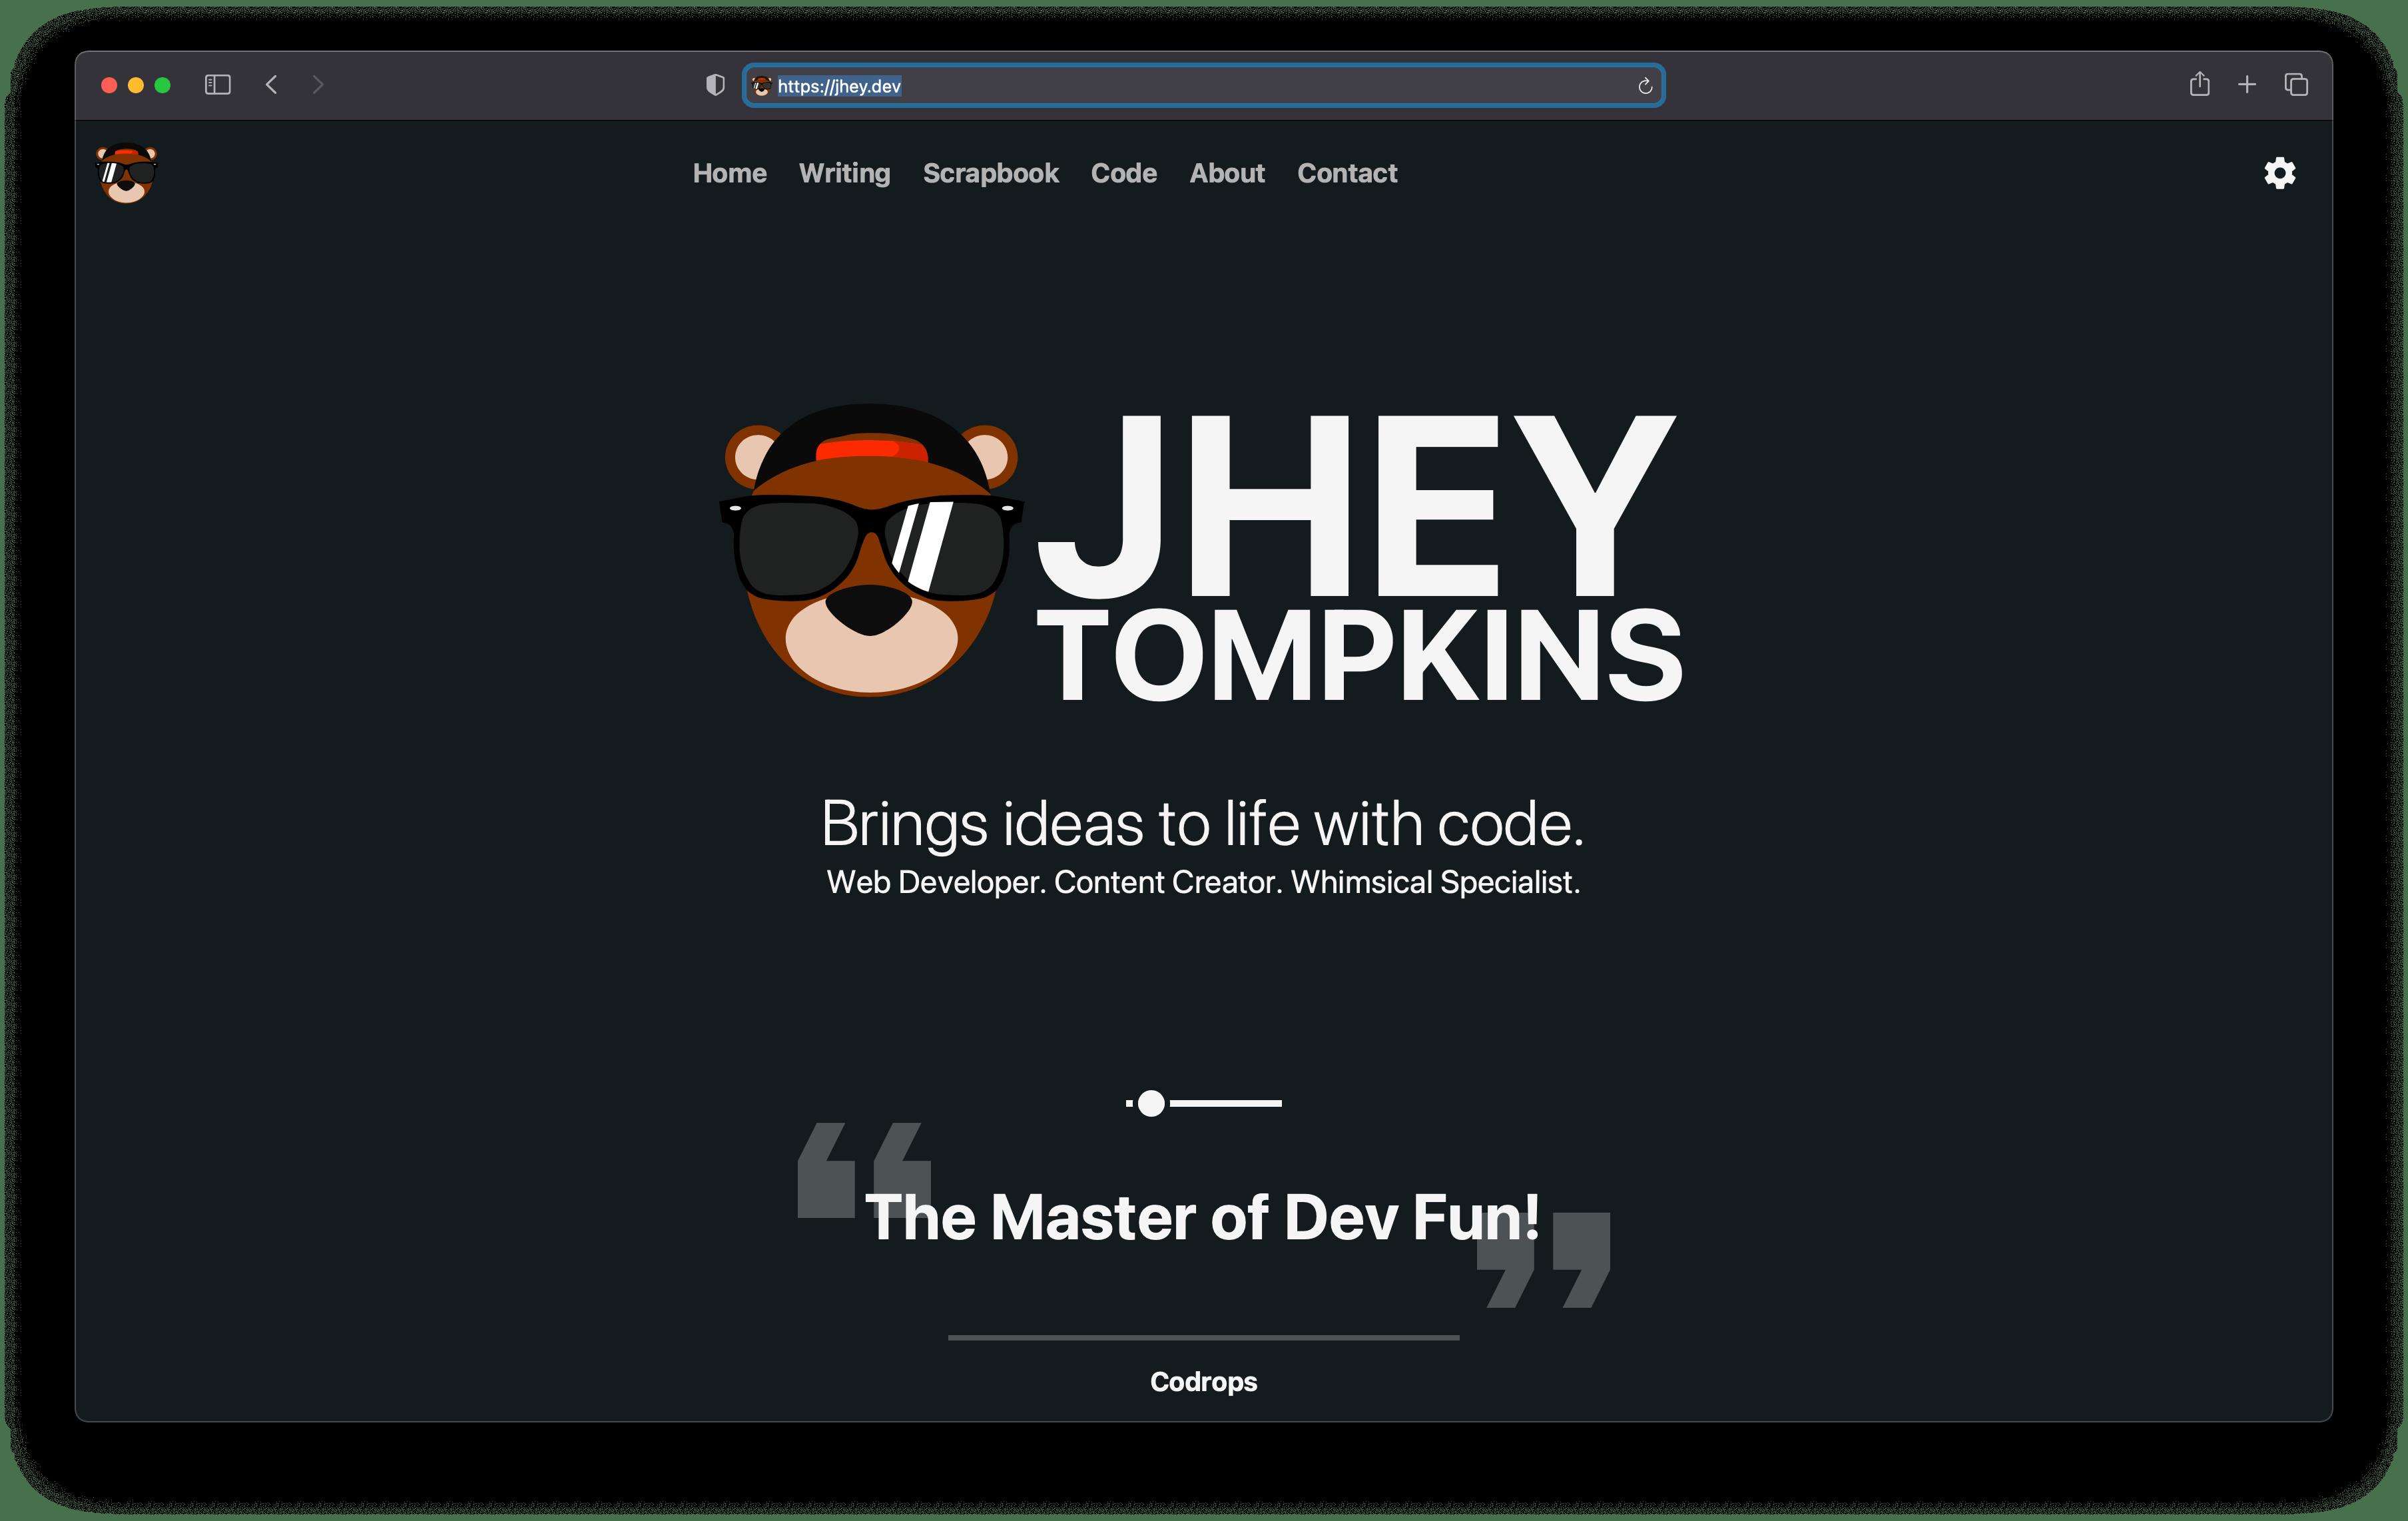 A screenshot of jhey.dev website